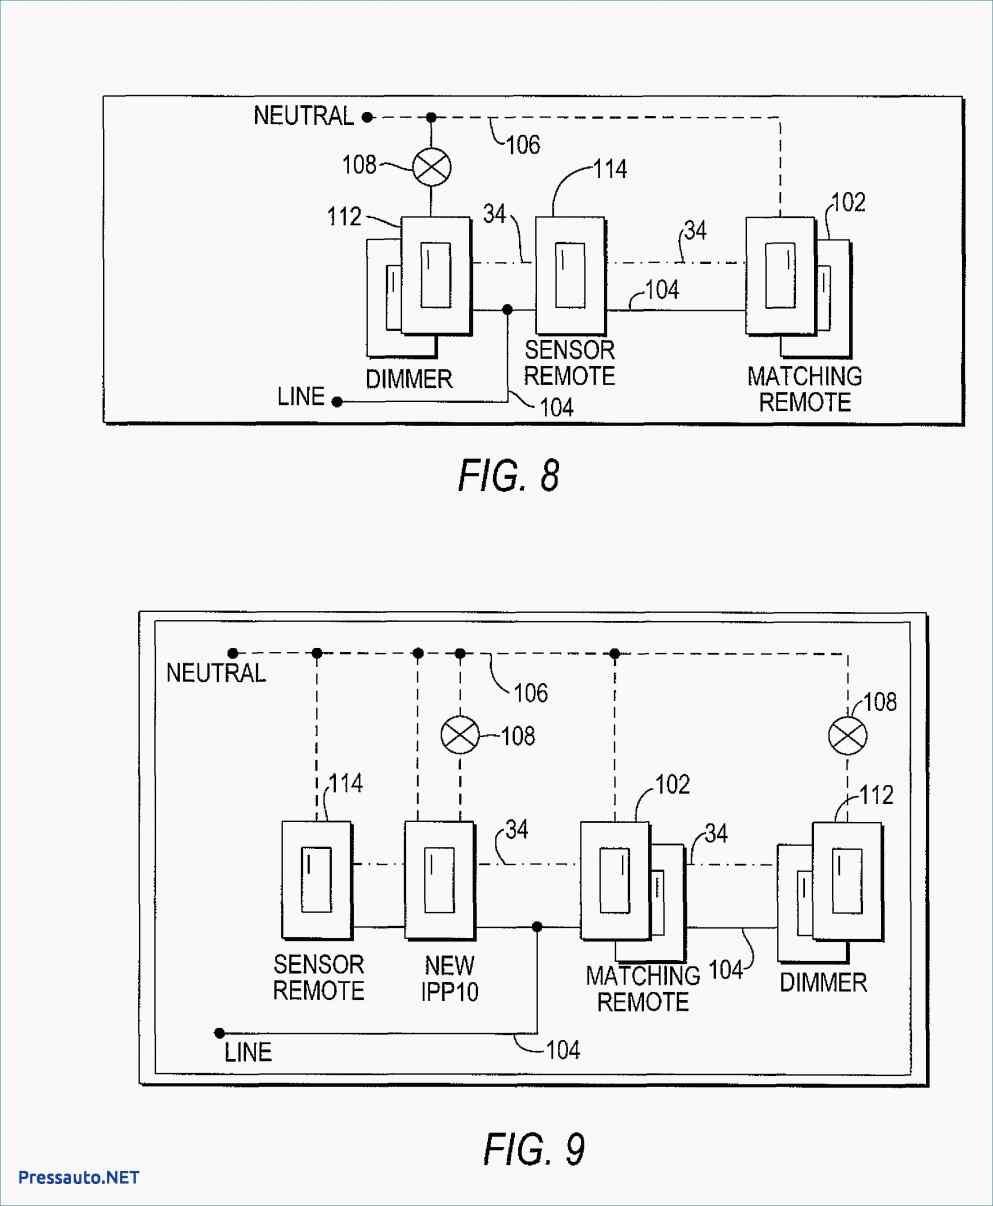 lutron maestro wiring diagram lutron wiring diagram wiring  lutron wiring diagram wiring